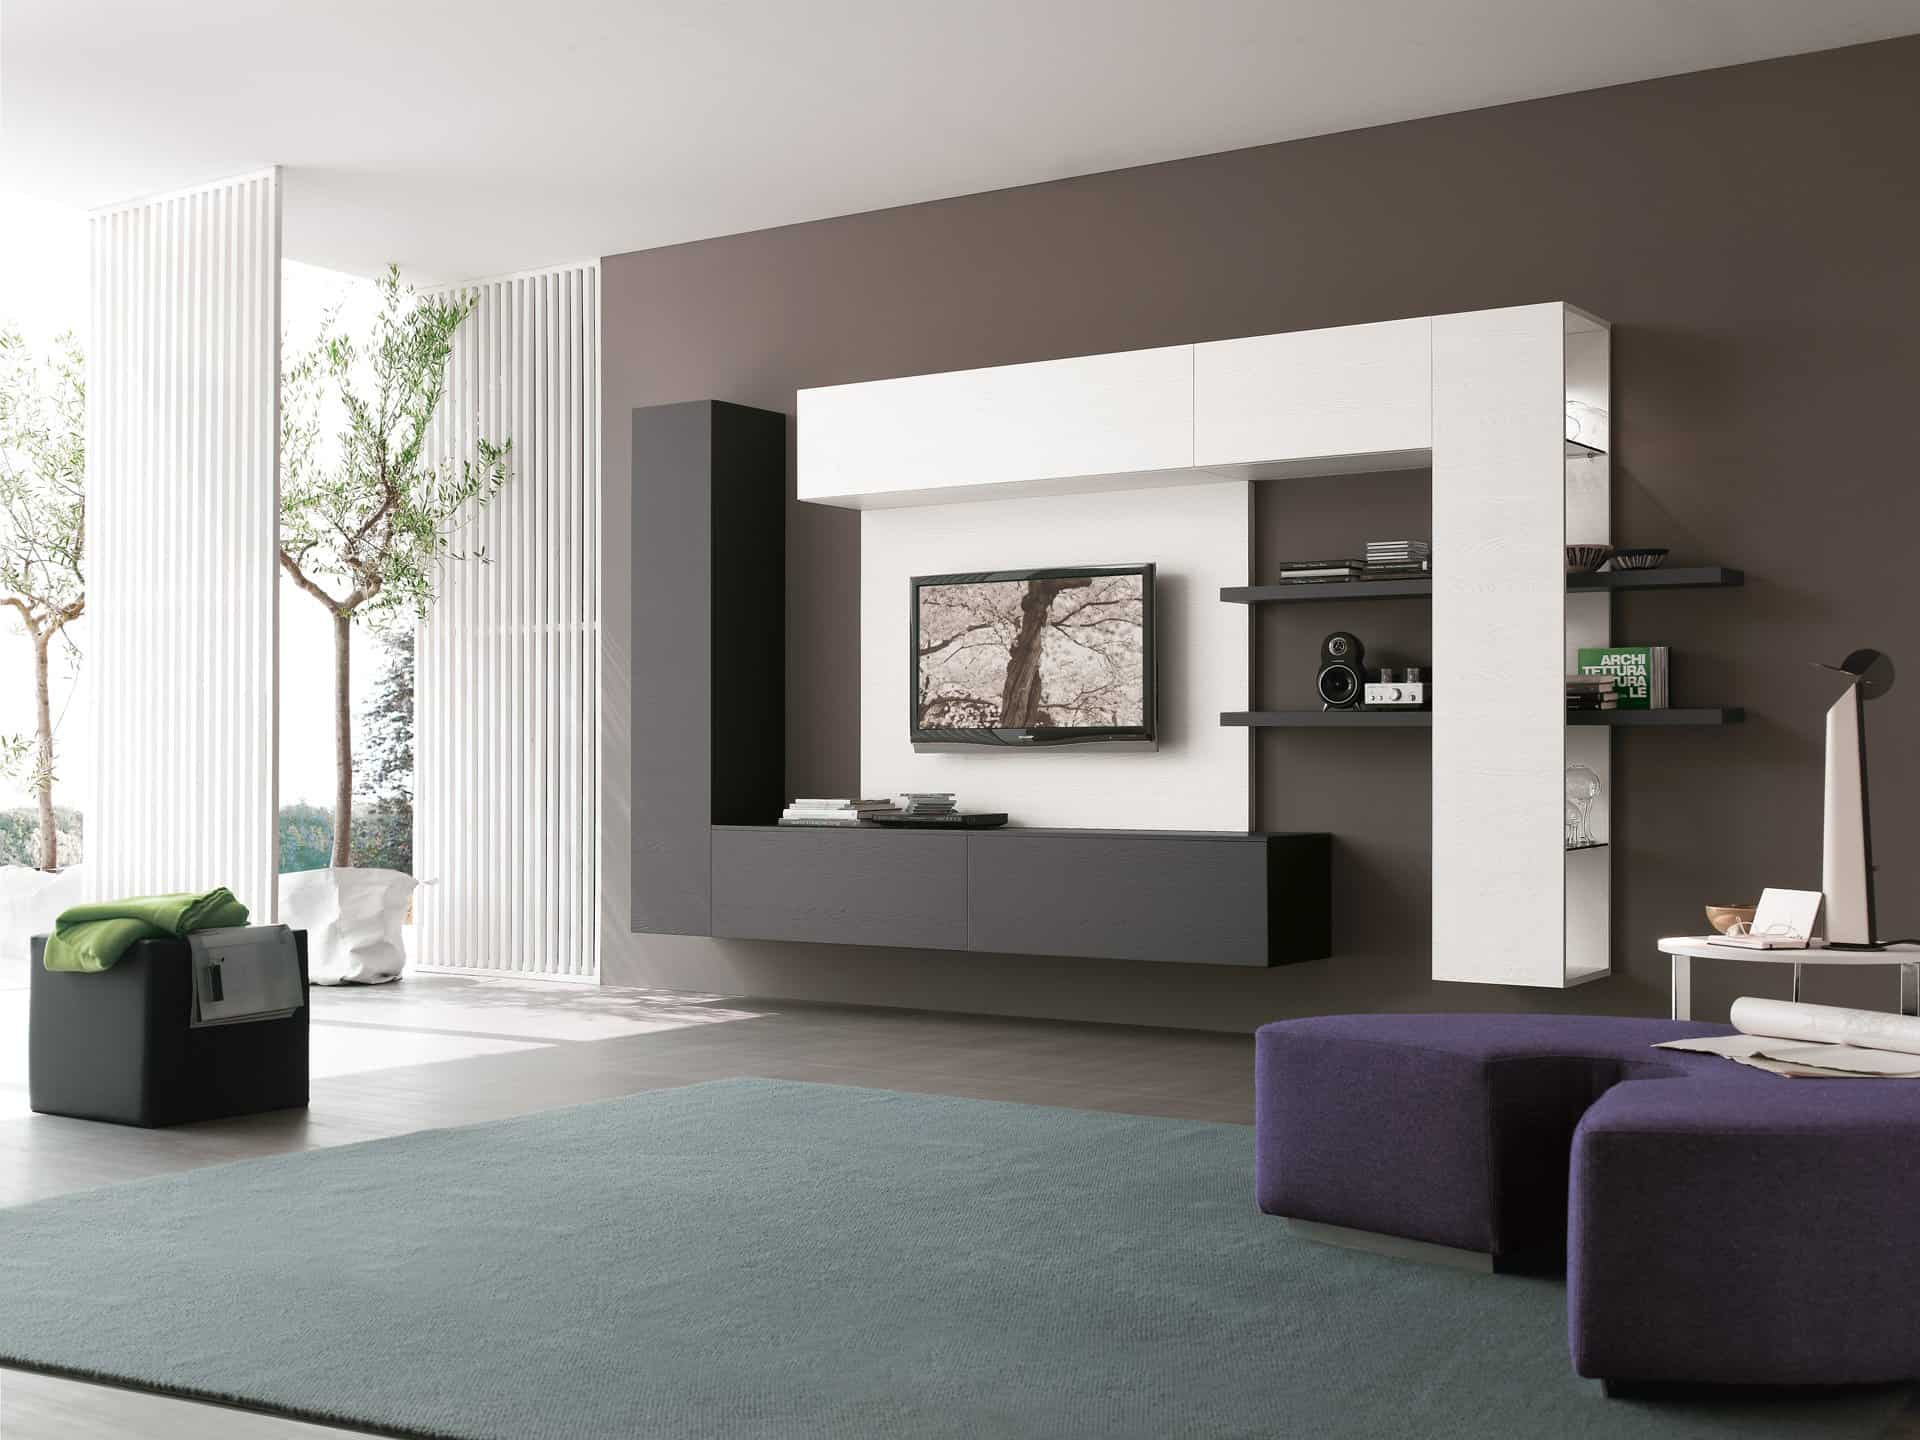 Living-room-ideas-High-tech-living-room-living-room-interior-modern-living-room